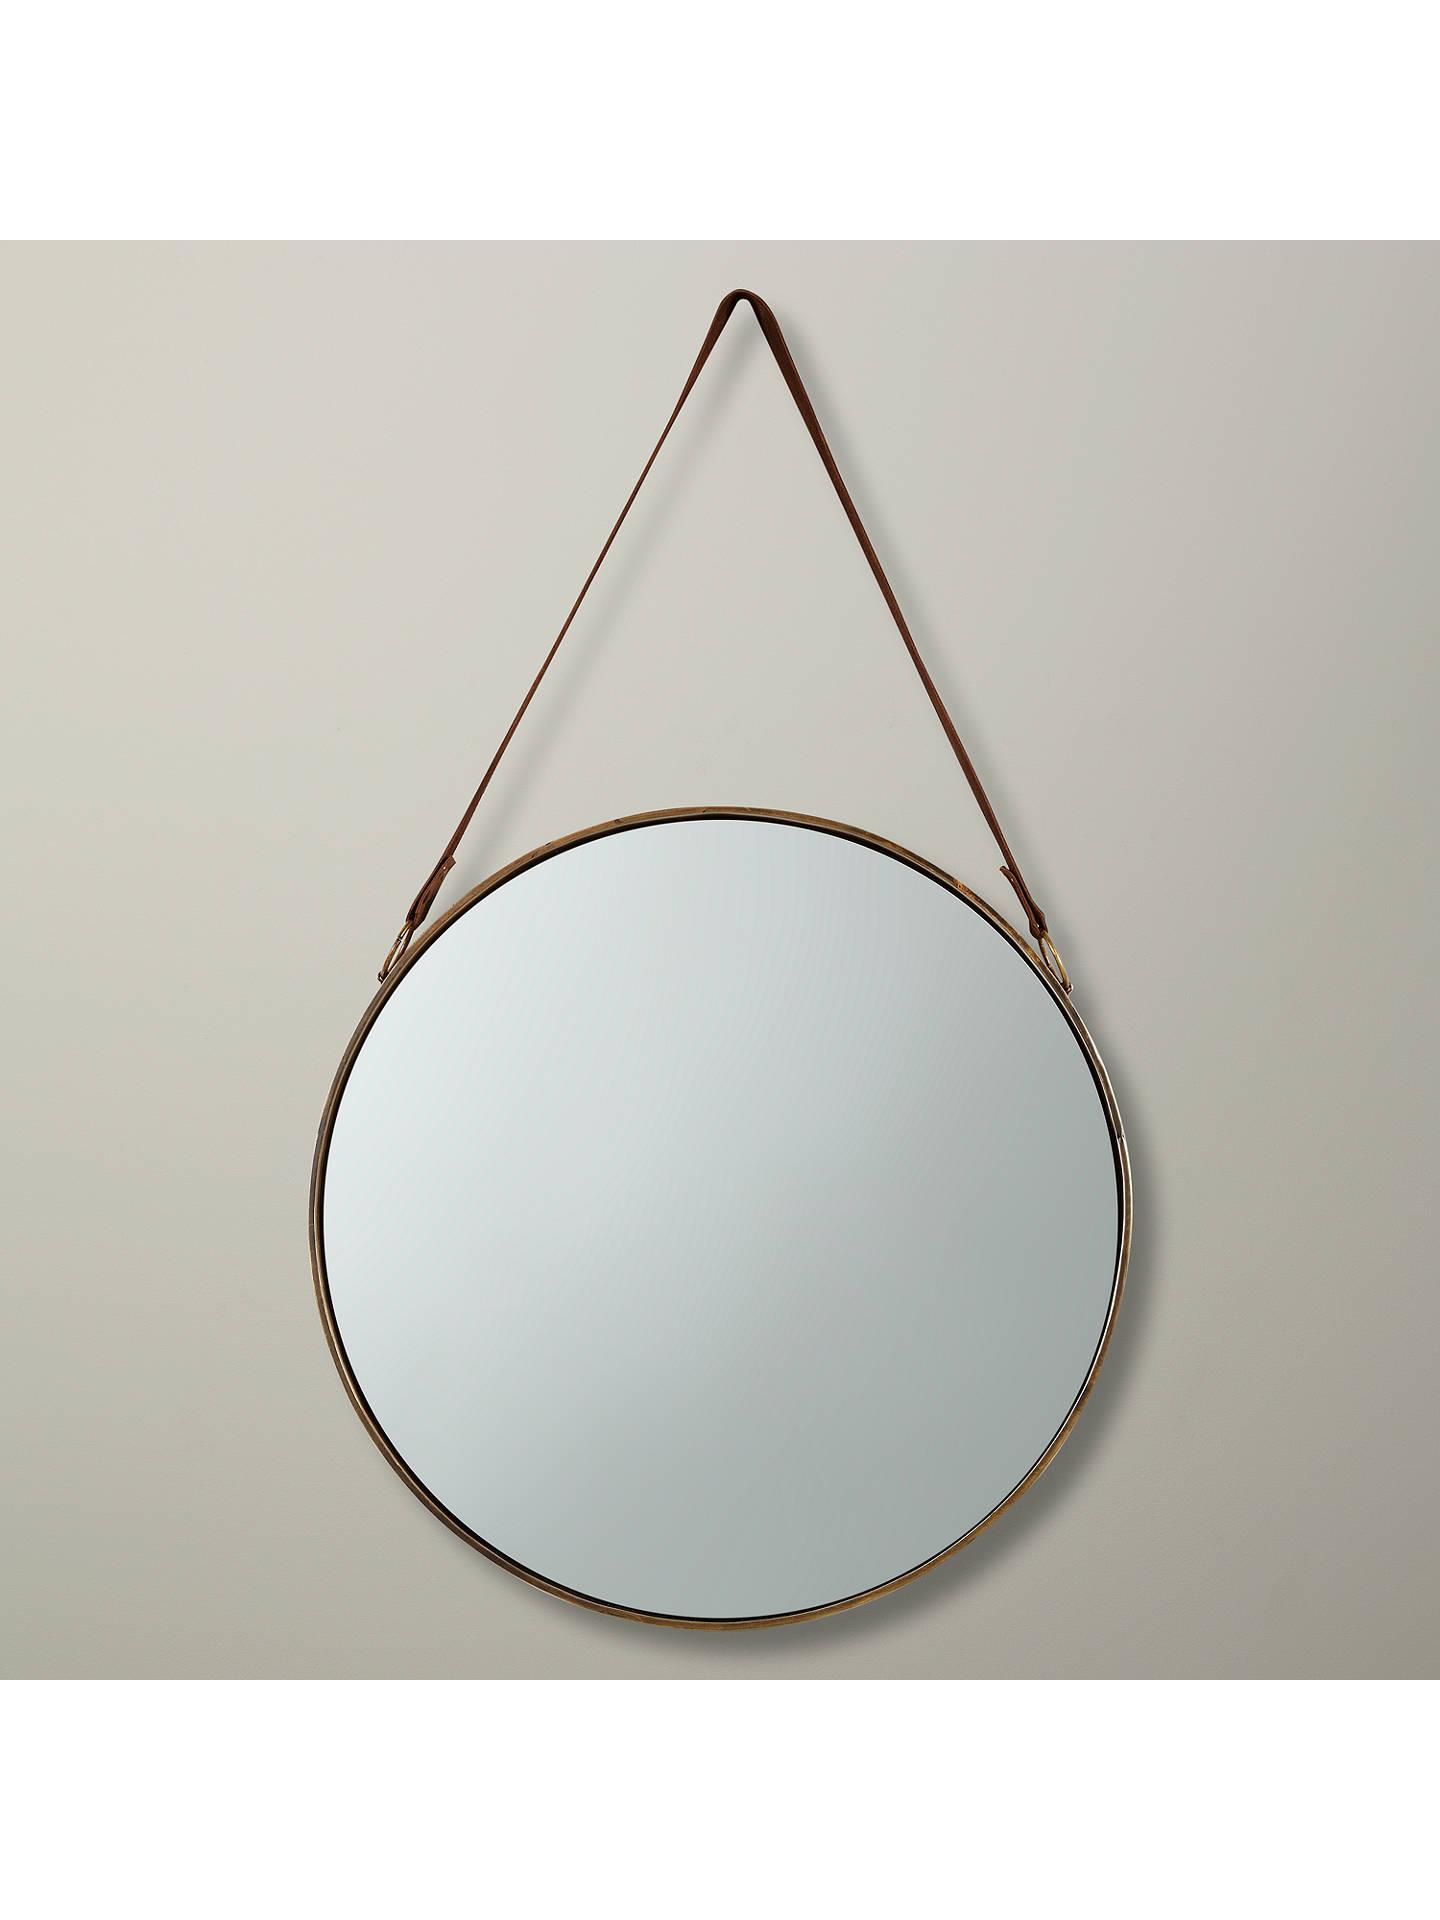 John Lewis Partners Ronda Round Hanging Mirror Dia 50cm Br